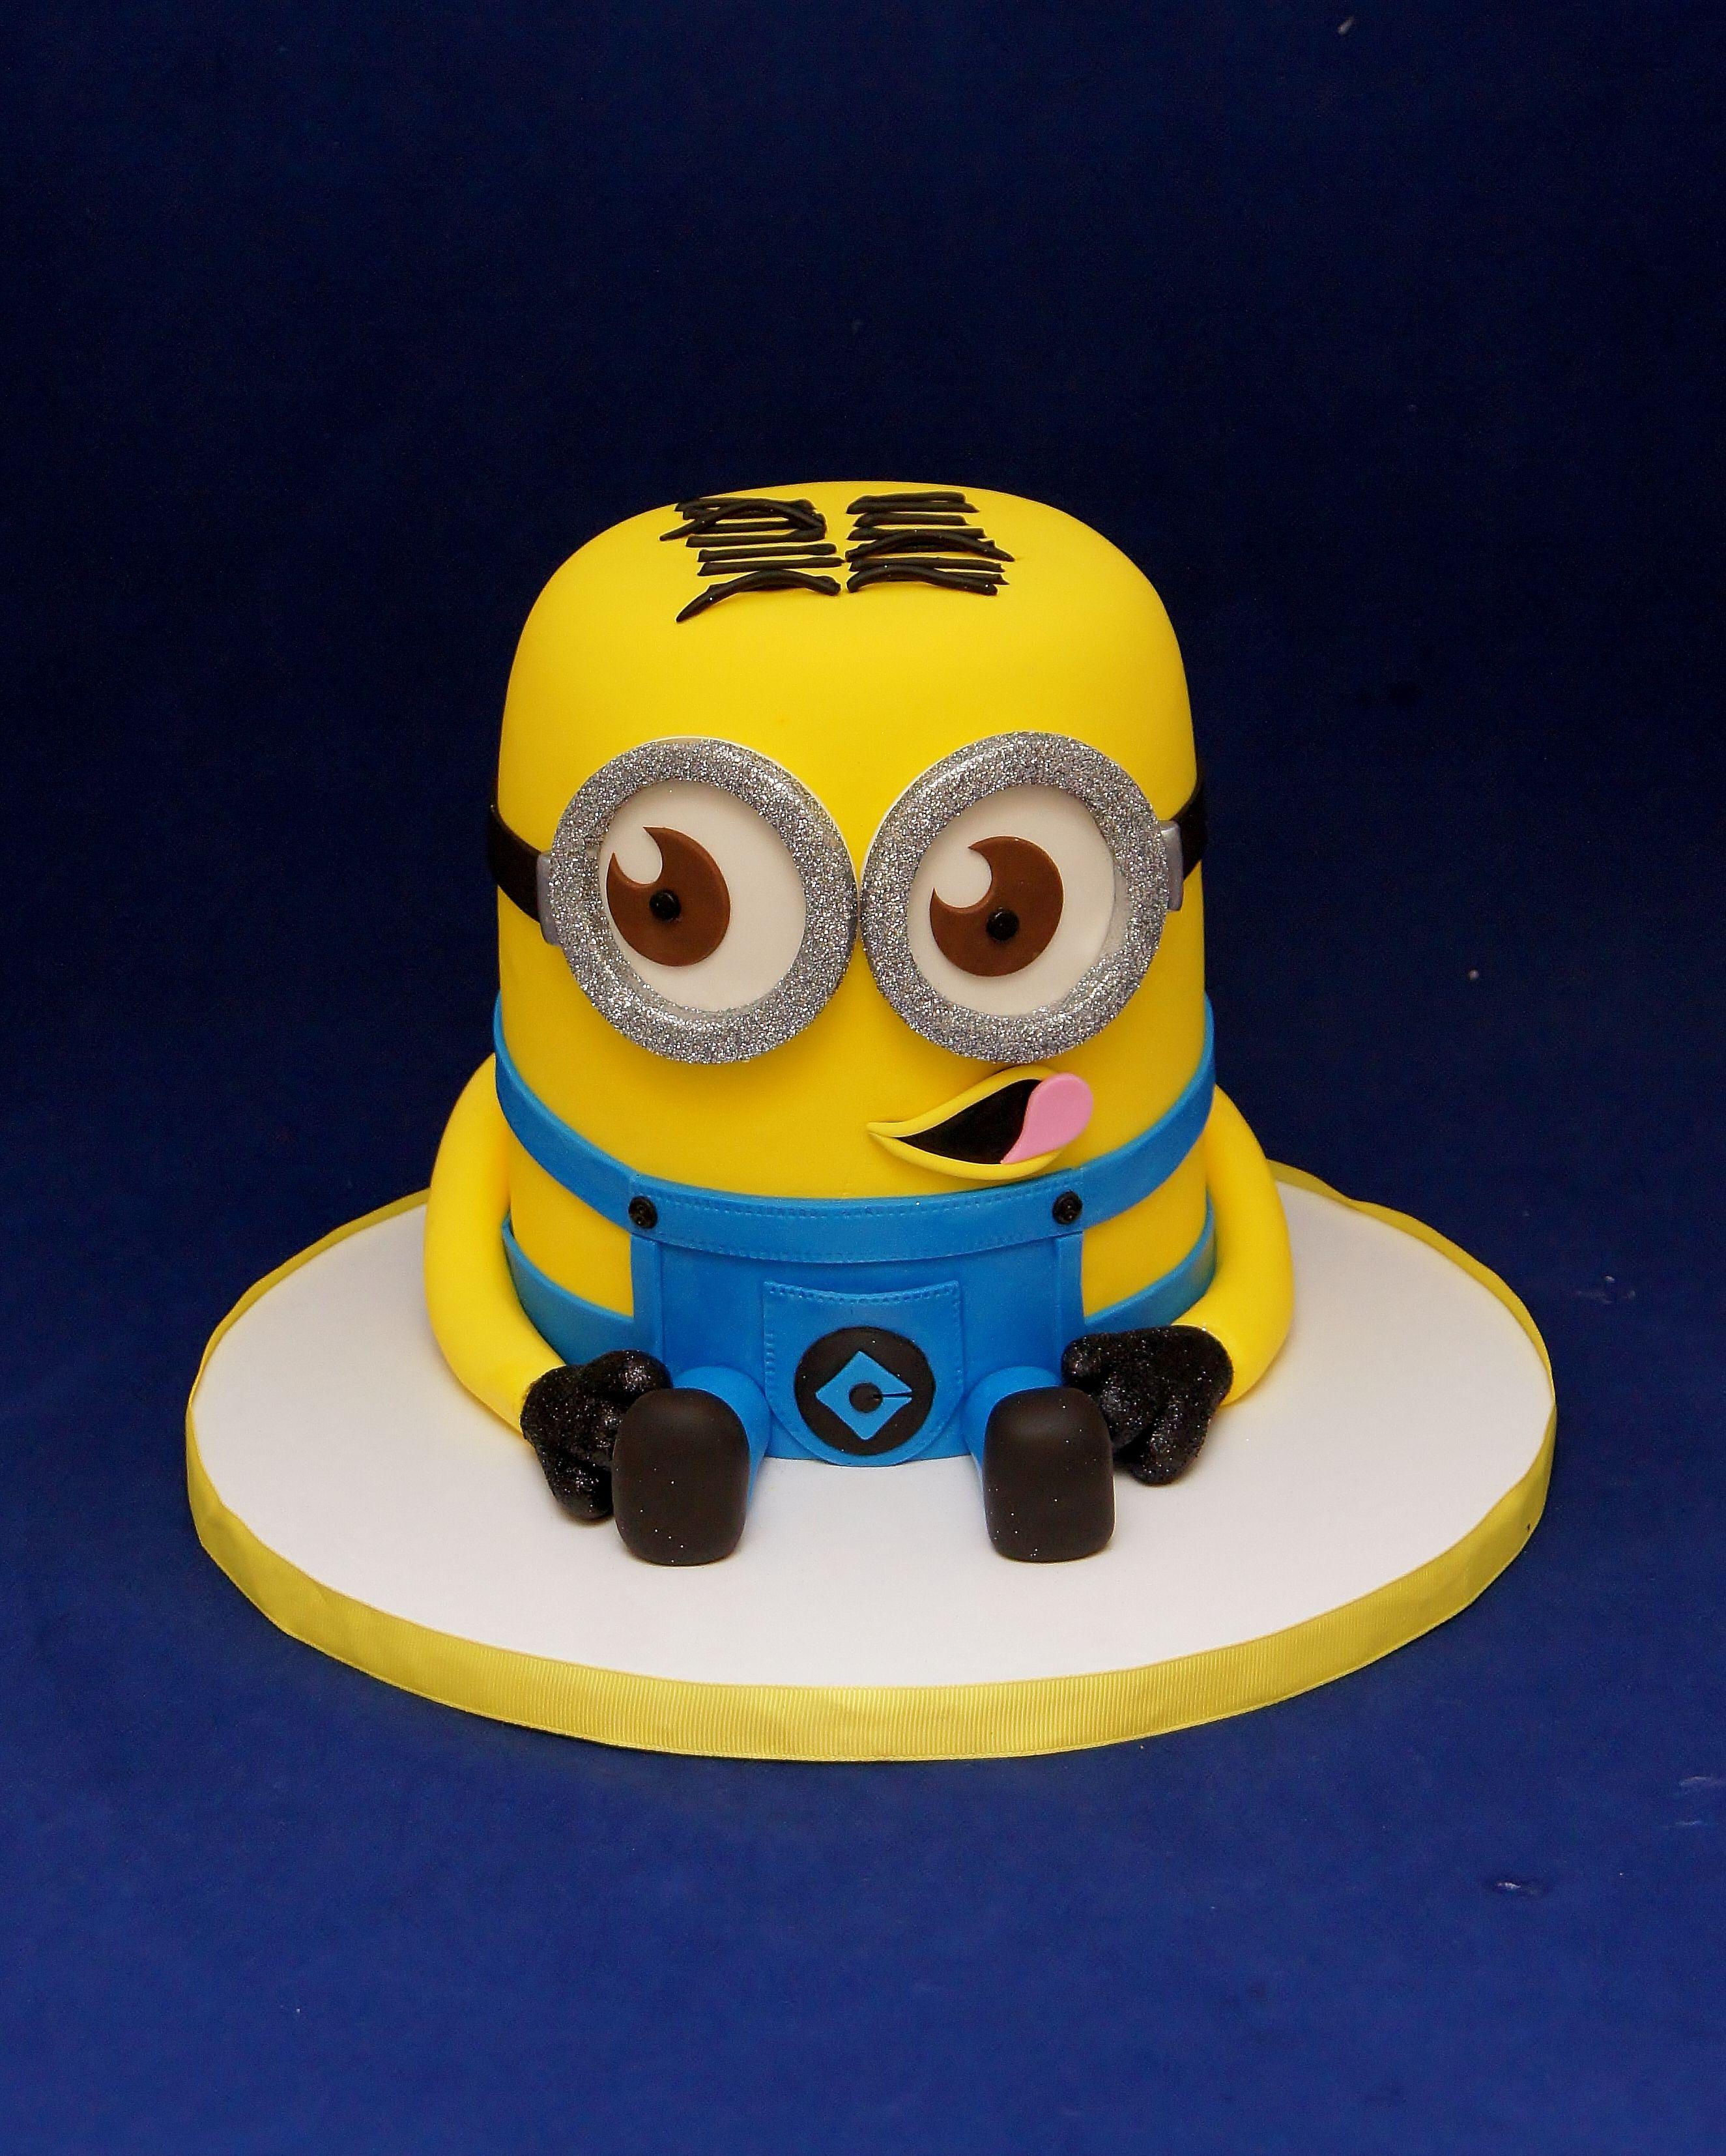 Minion Cake 3D Minion Dave Cake 3D Cakes Pinterest Minion